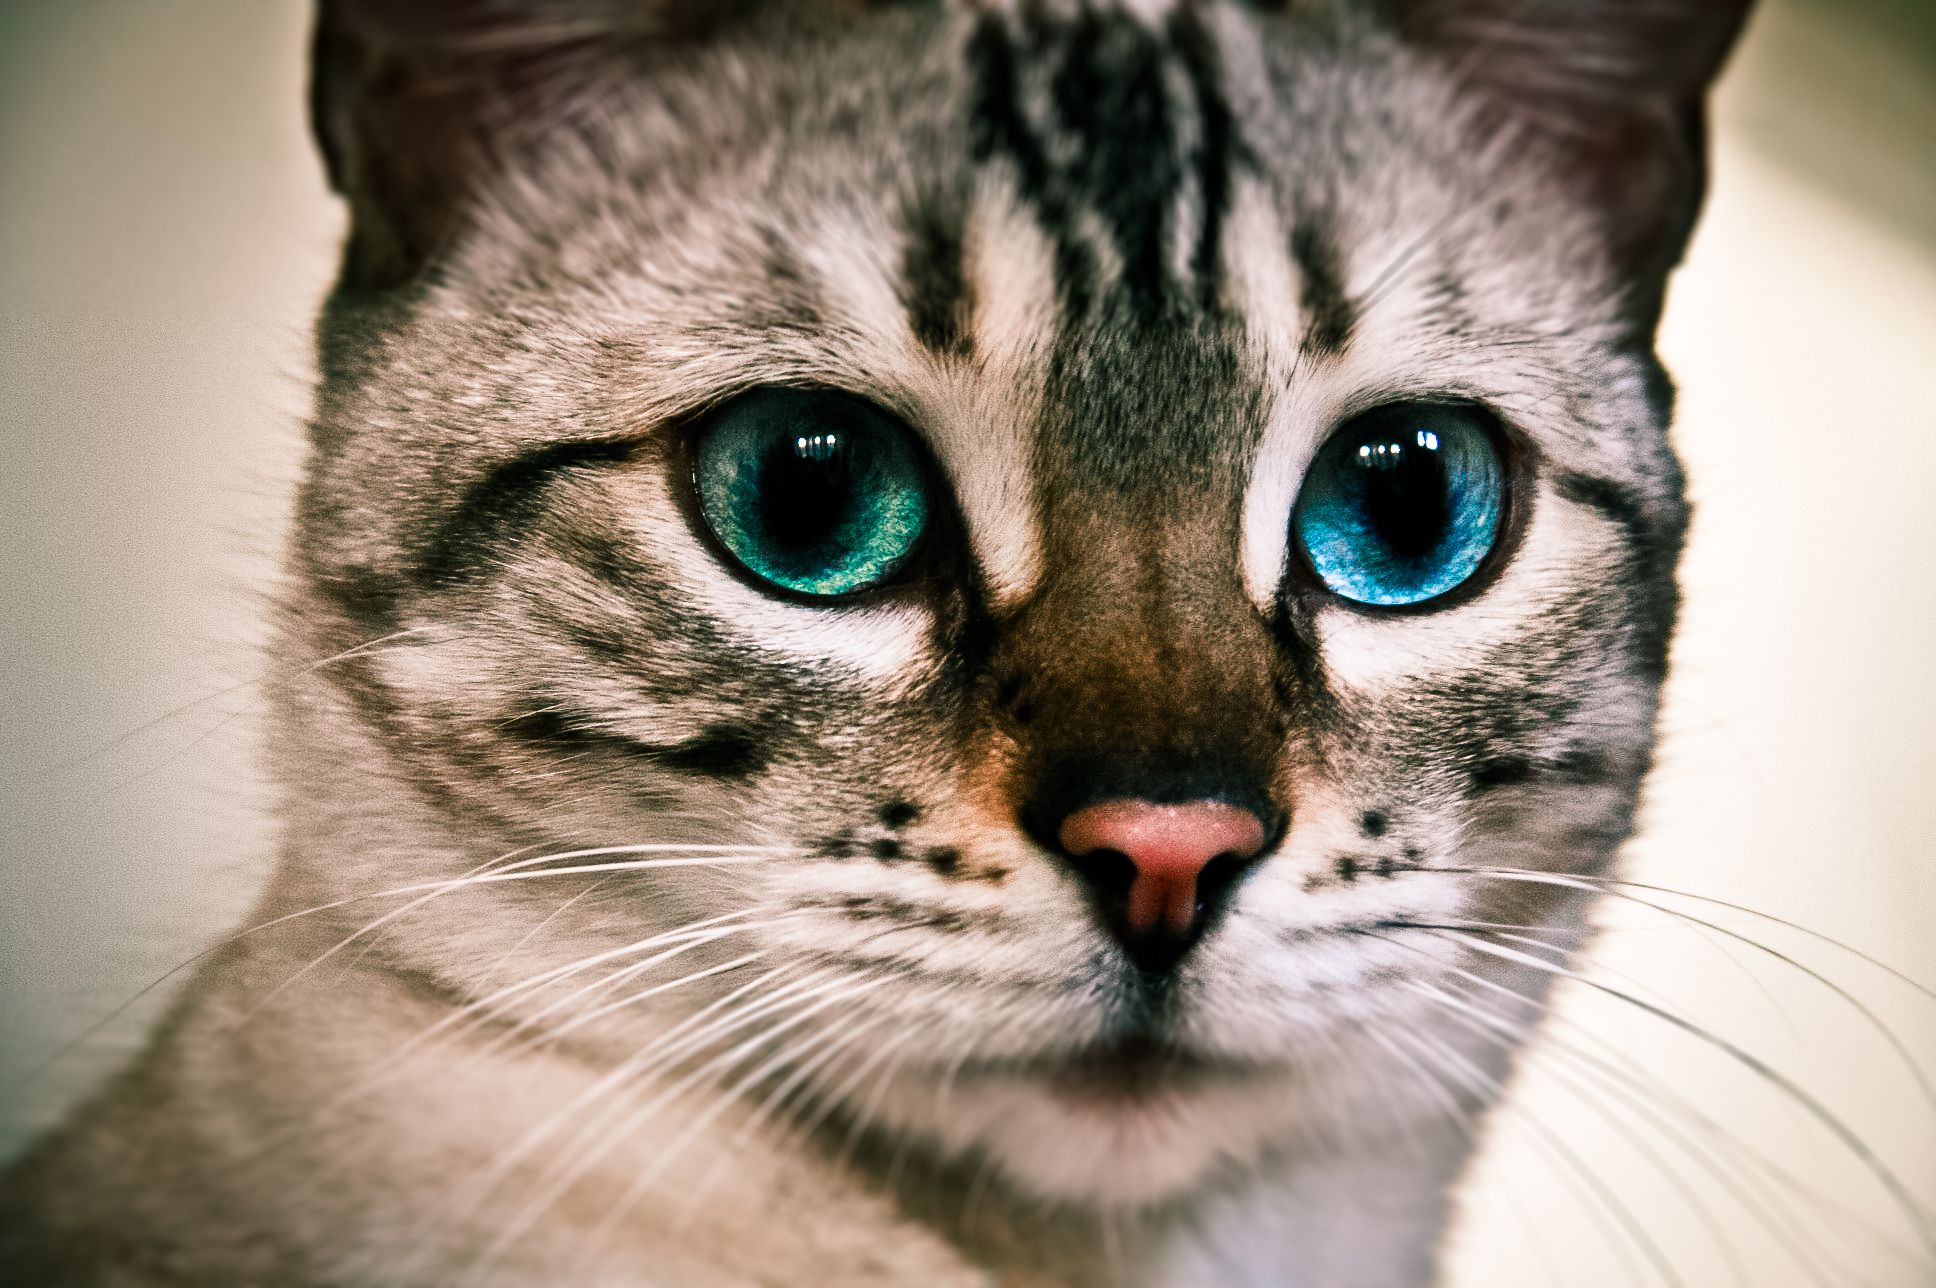 snow bengal kitty cat cateyes blueeyes Toyger cat